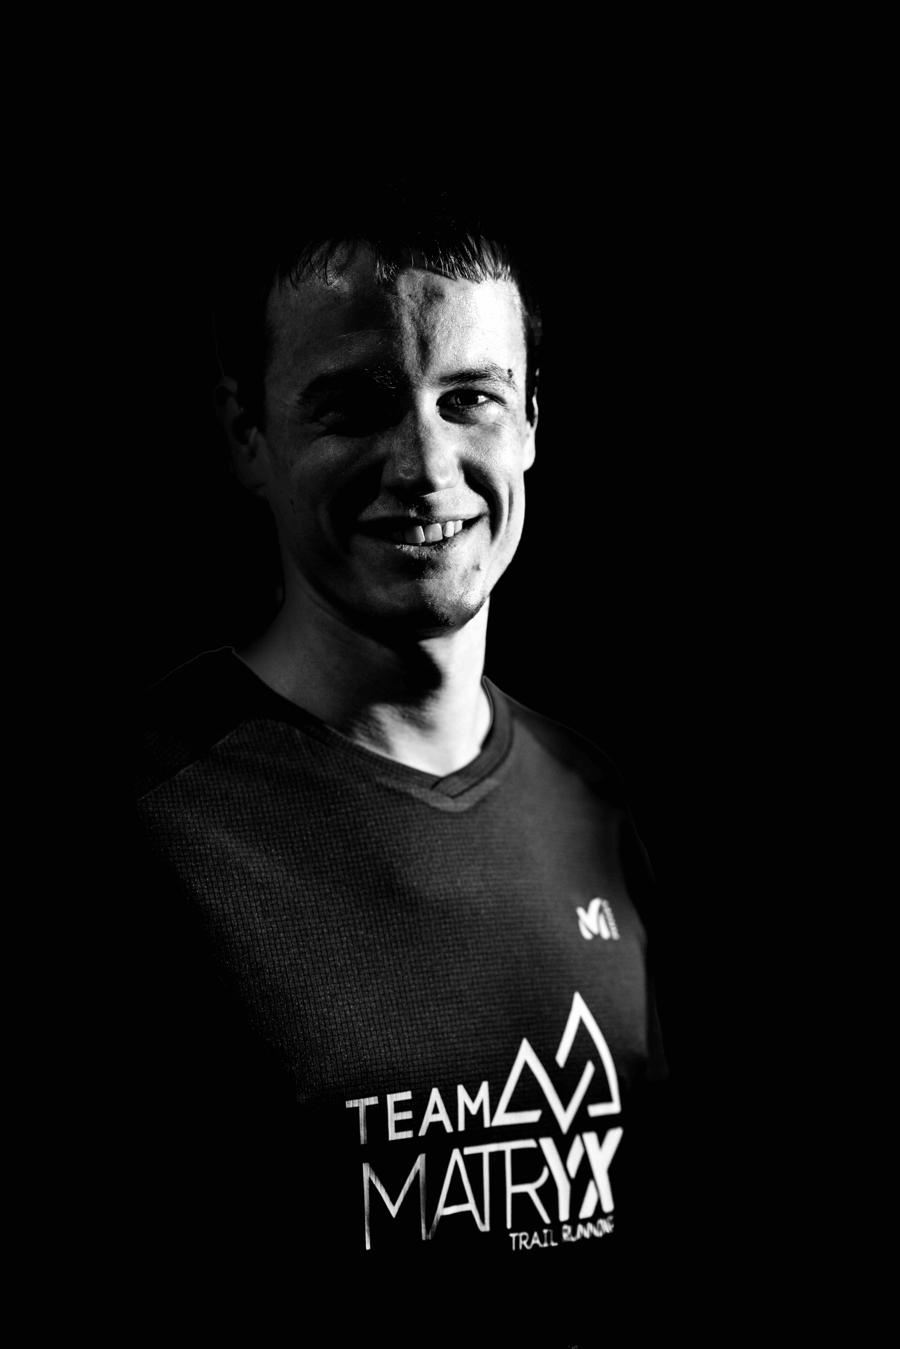 Team Matryx -